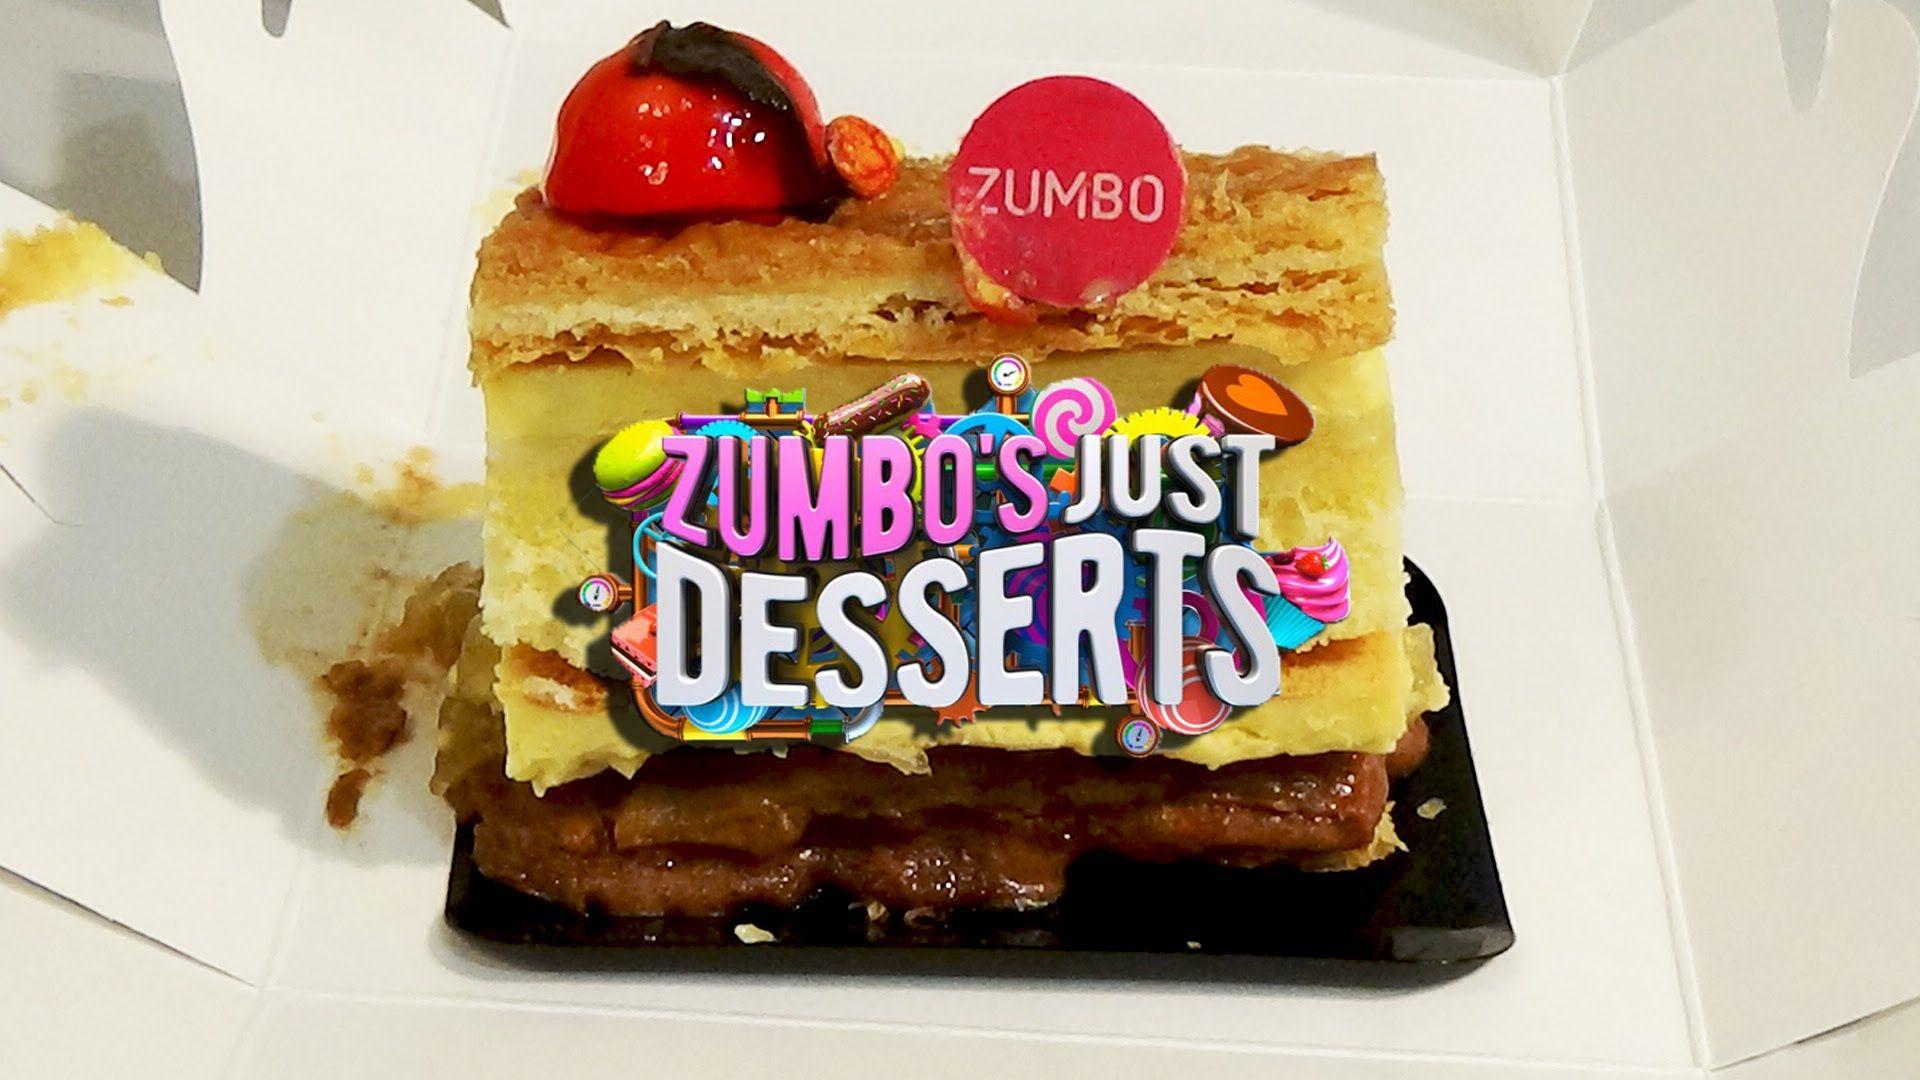 Birthday Cakes Zumbo ~ Adriano zumbo 'back to school' dessert review taste test birdpoo